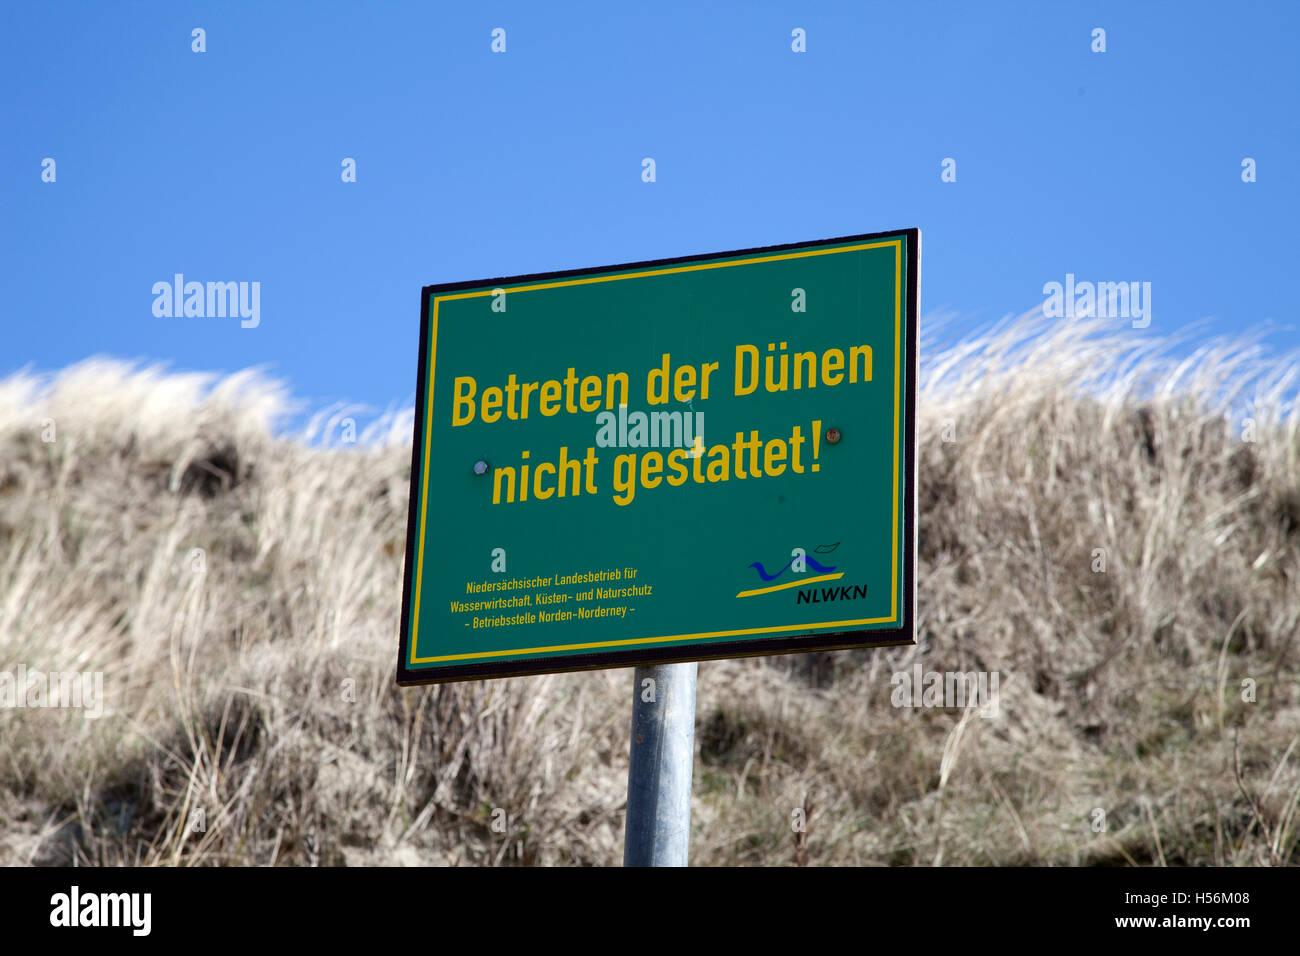 Prohibition sign, 'Betreten der Duenen nicht gestattet', German for 'keep off the dunes', Wadden - Stock Image